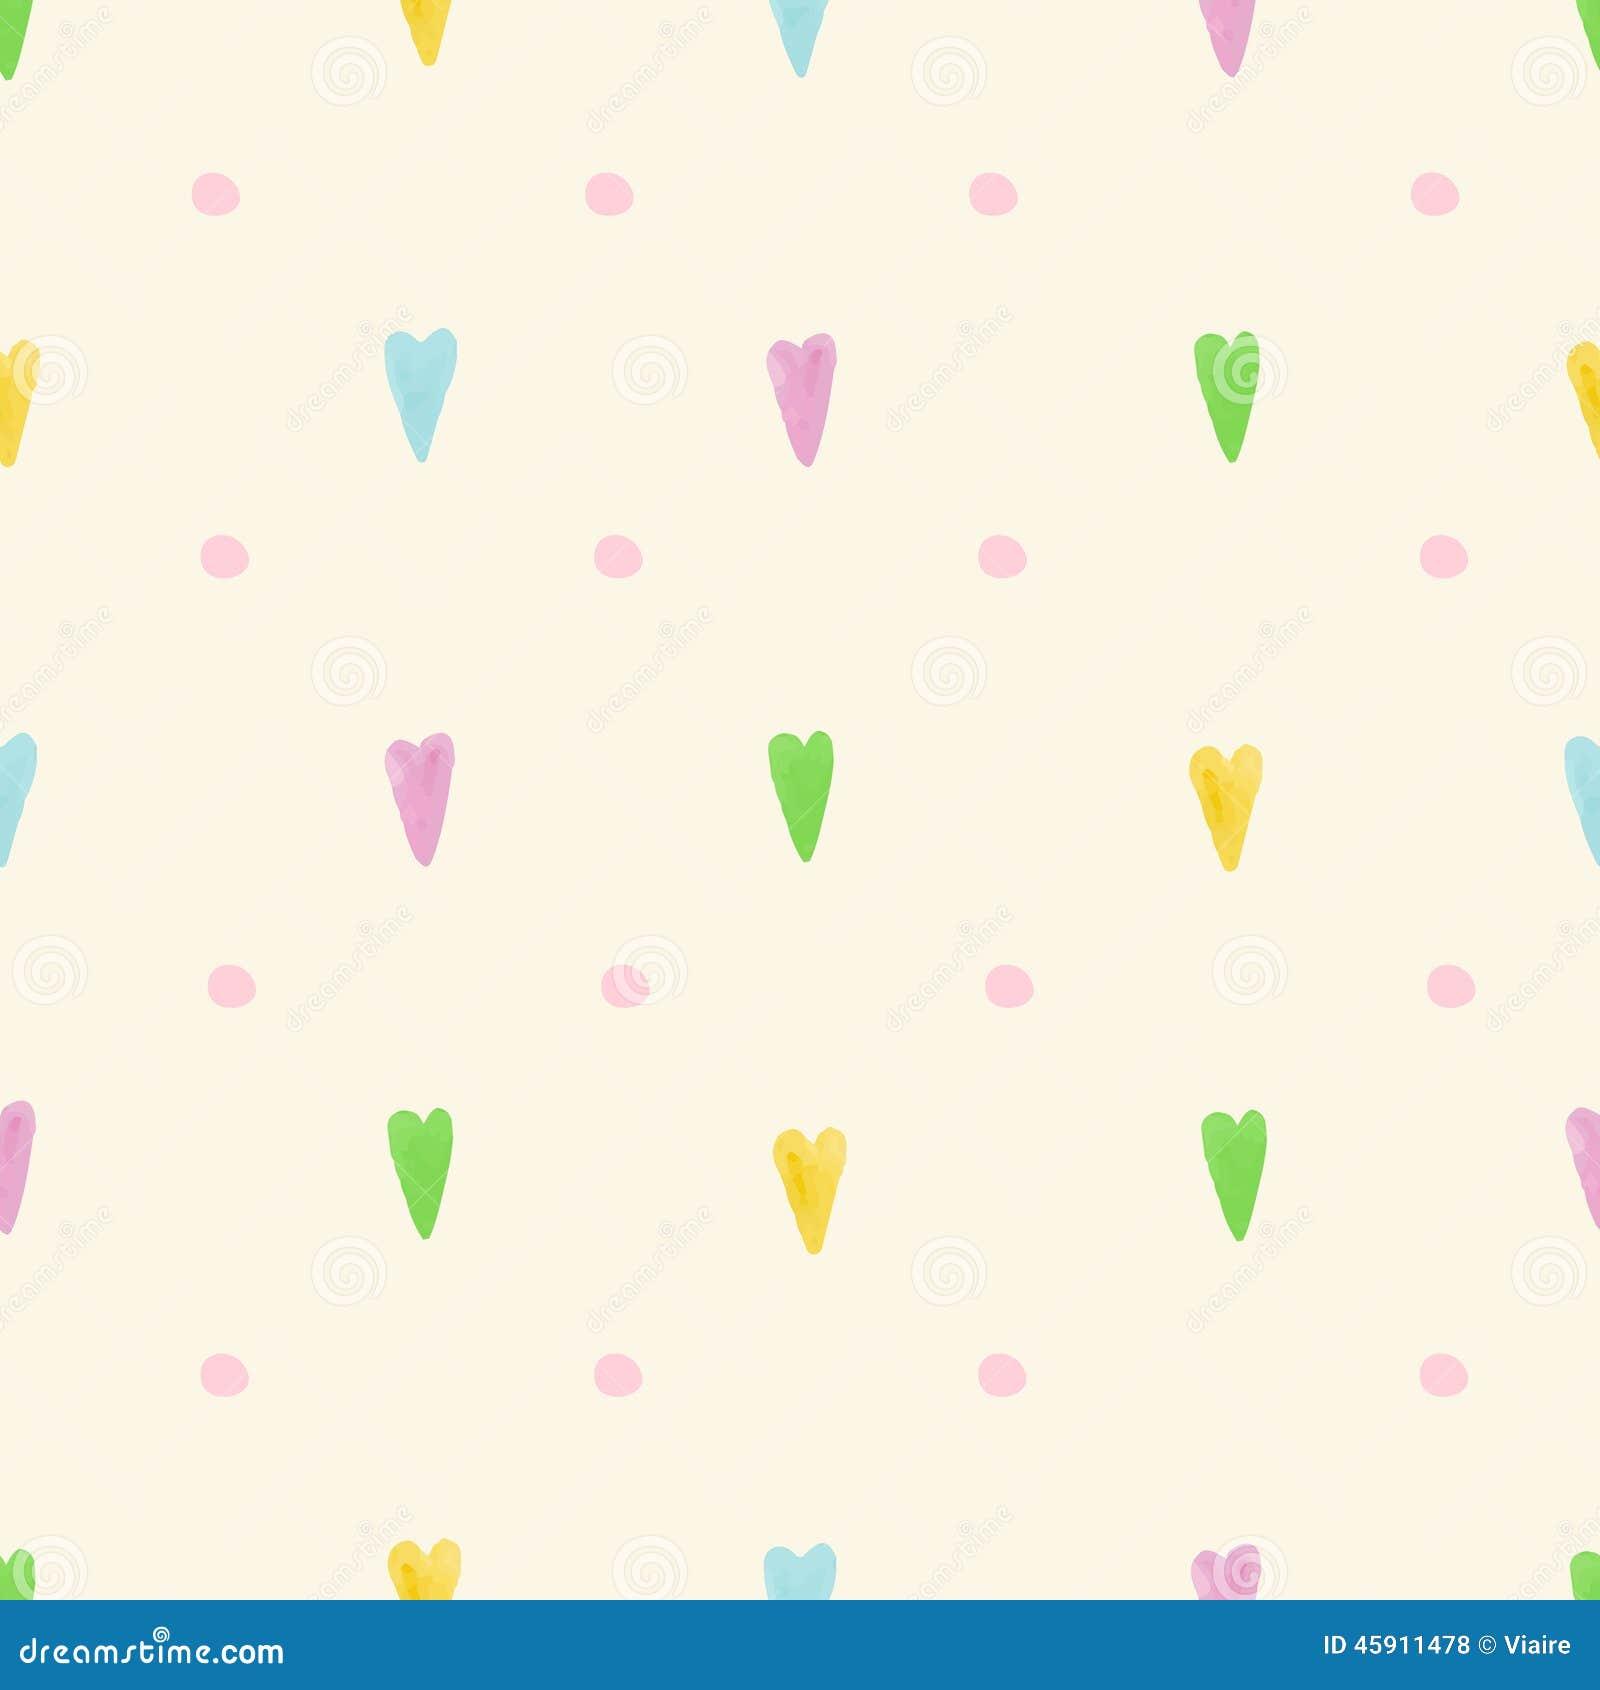 Сute pattern